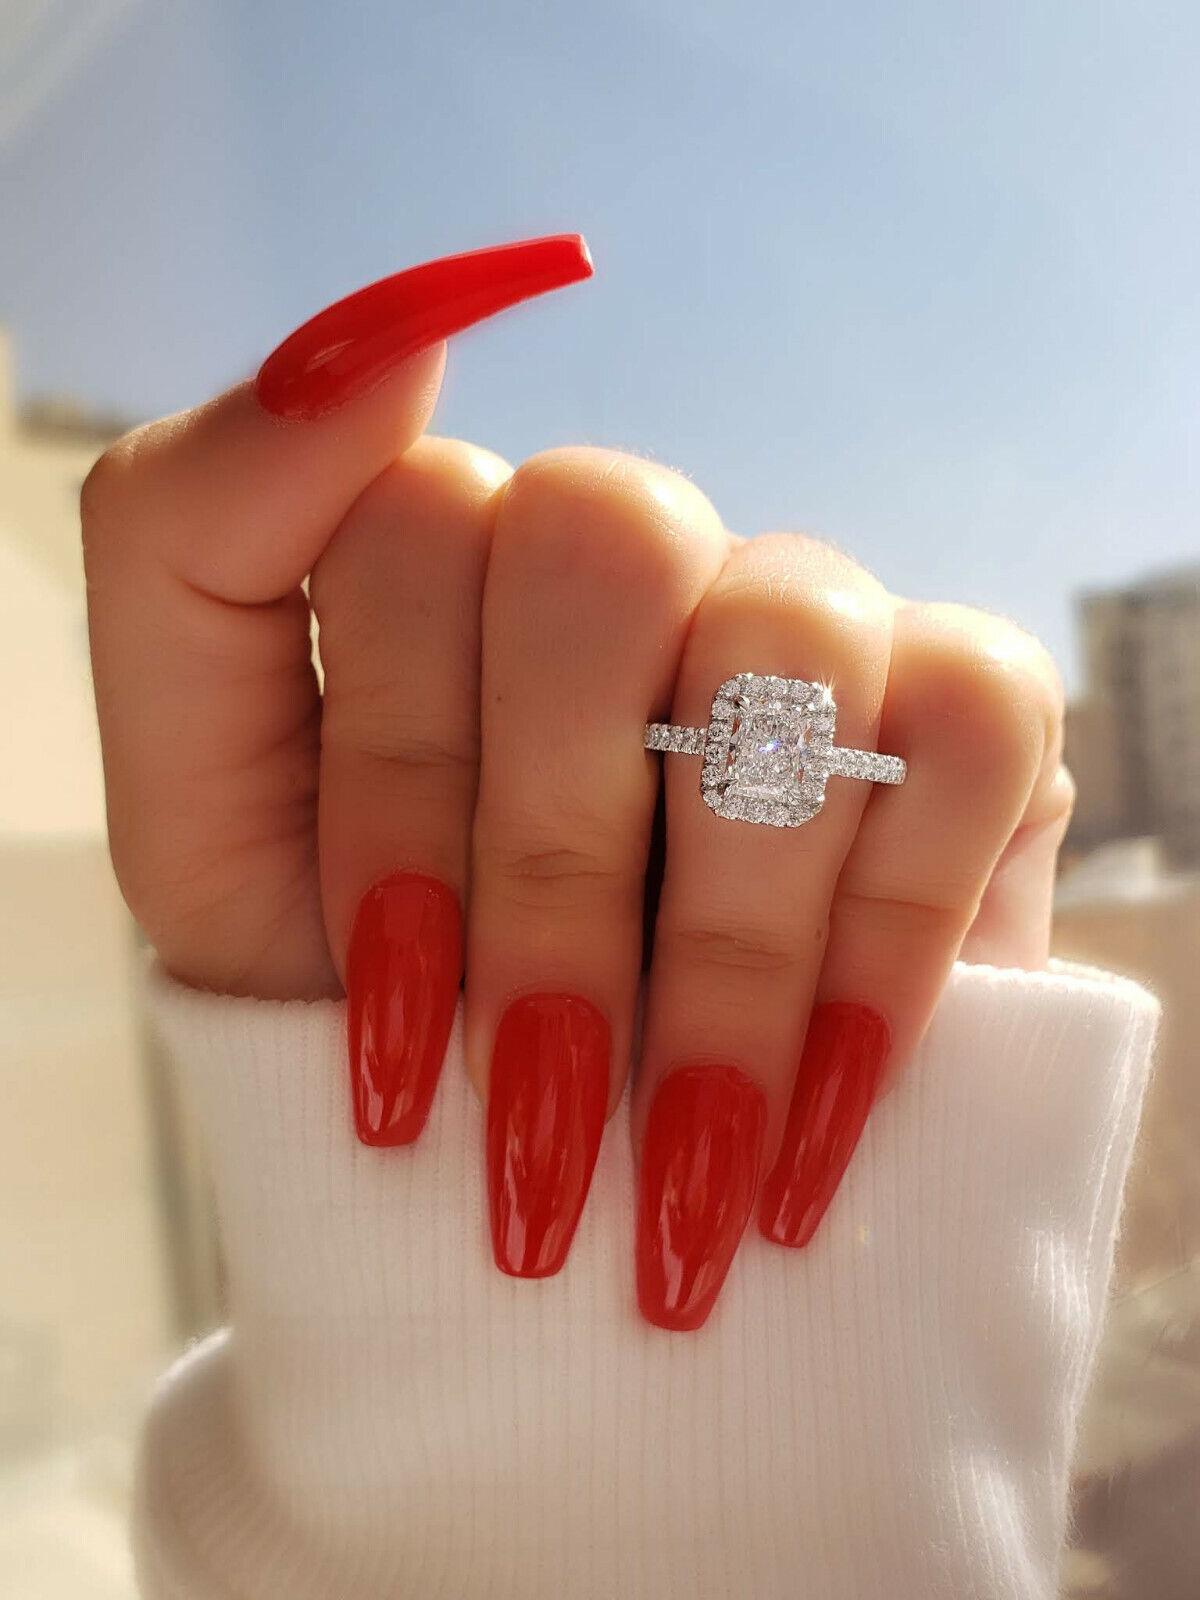 18K WG 1.80 Ctw Radiant Cut Diamond Eternity Halo Engagement Ring H,VS2 GIA 1